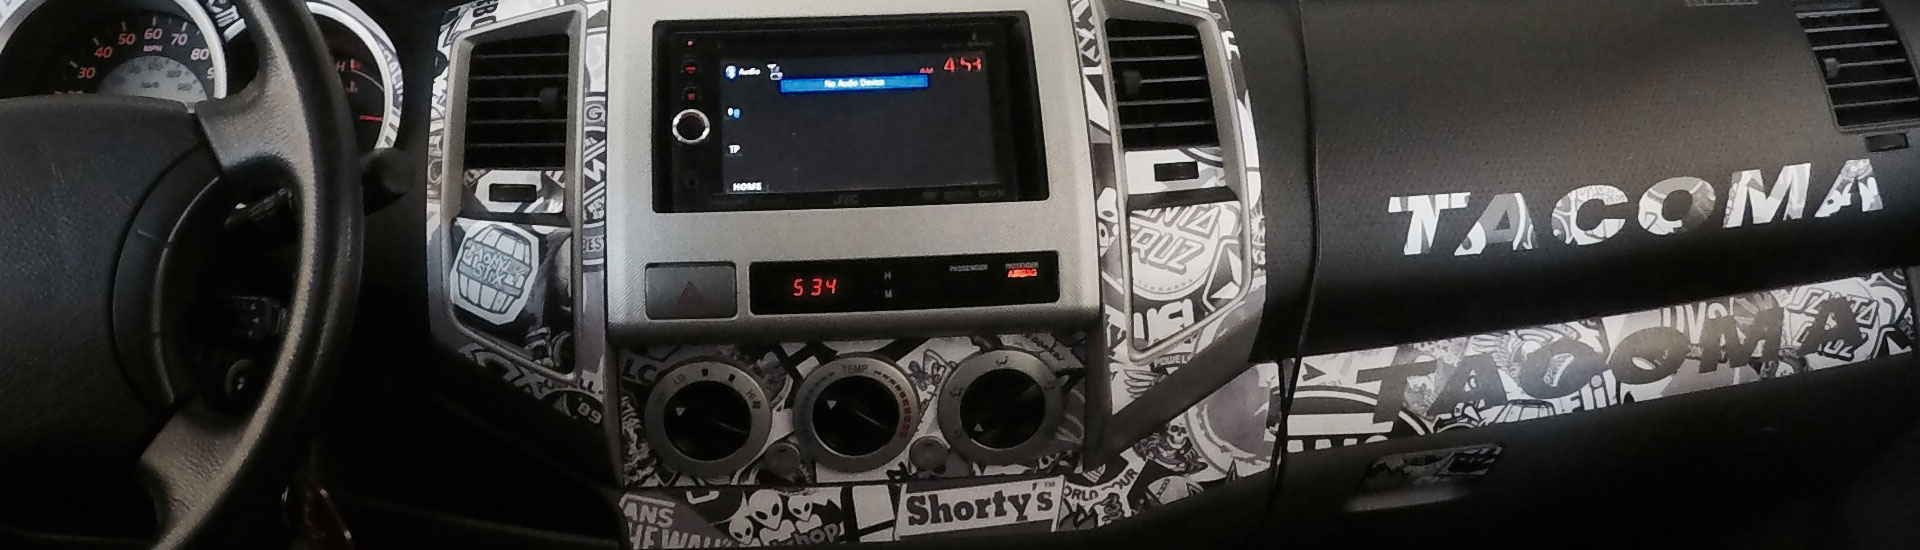 Toyota Tacoma Dash Kits | Custom Toyota Tacoma Dash Kit